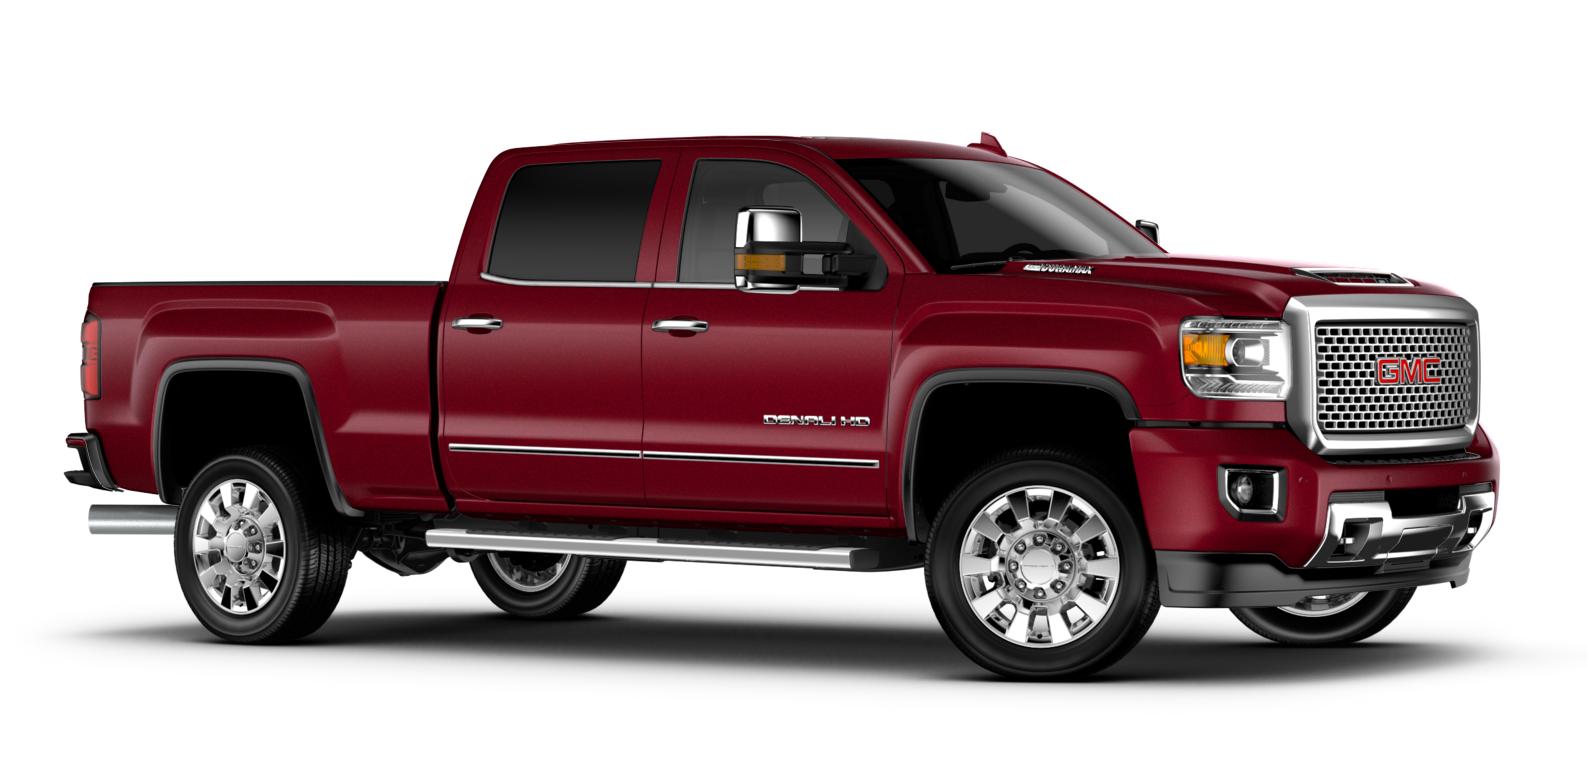 most expensive truck - sierra-2500-denali